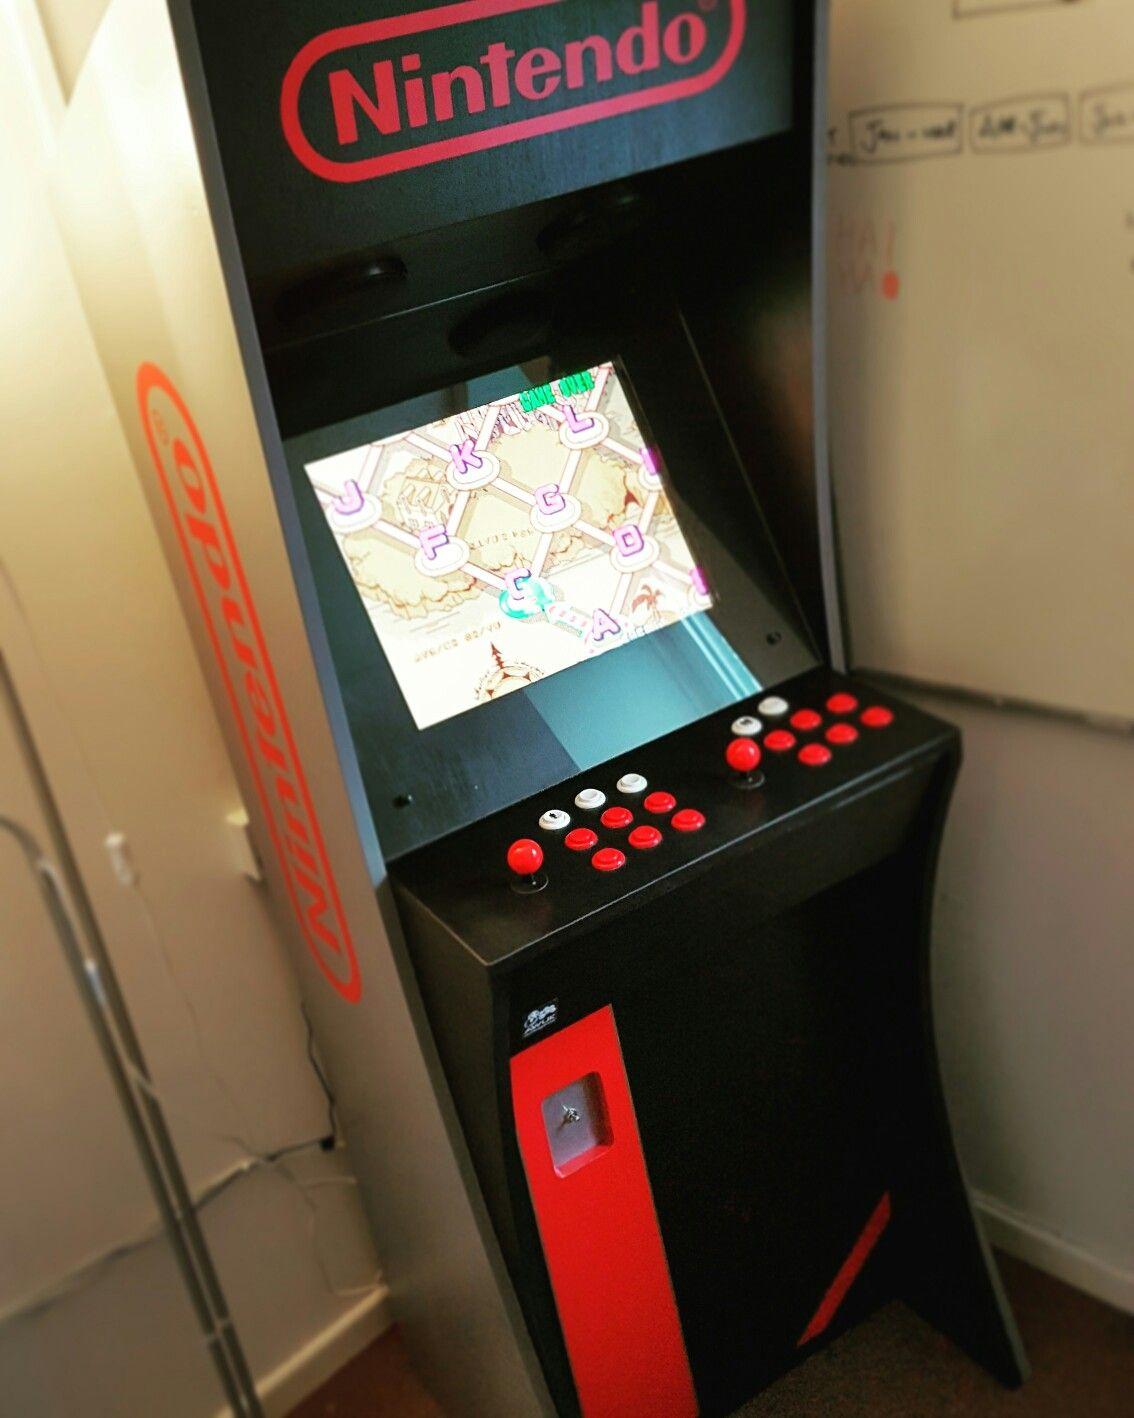 The fully upgraded Mark Zen multi game arcade machine